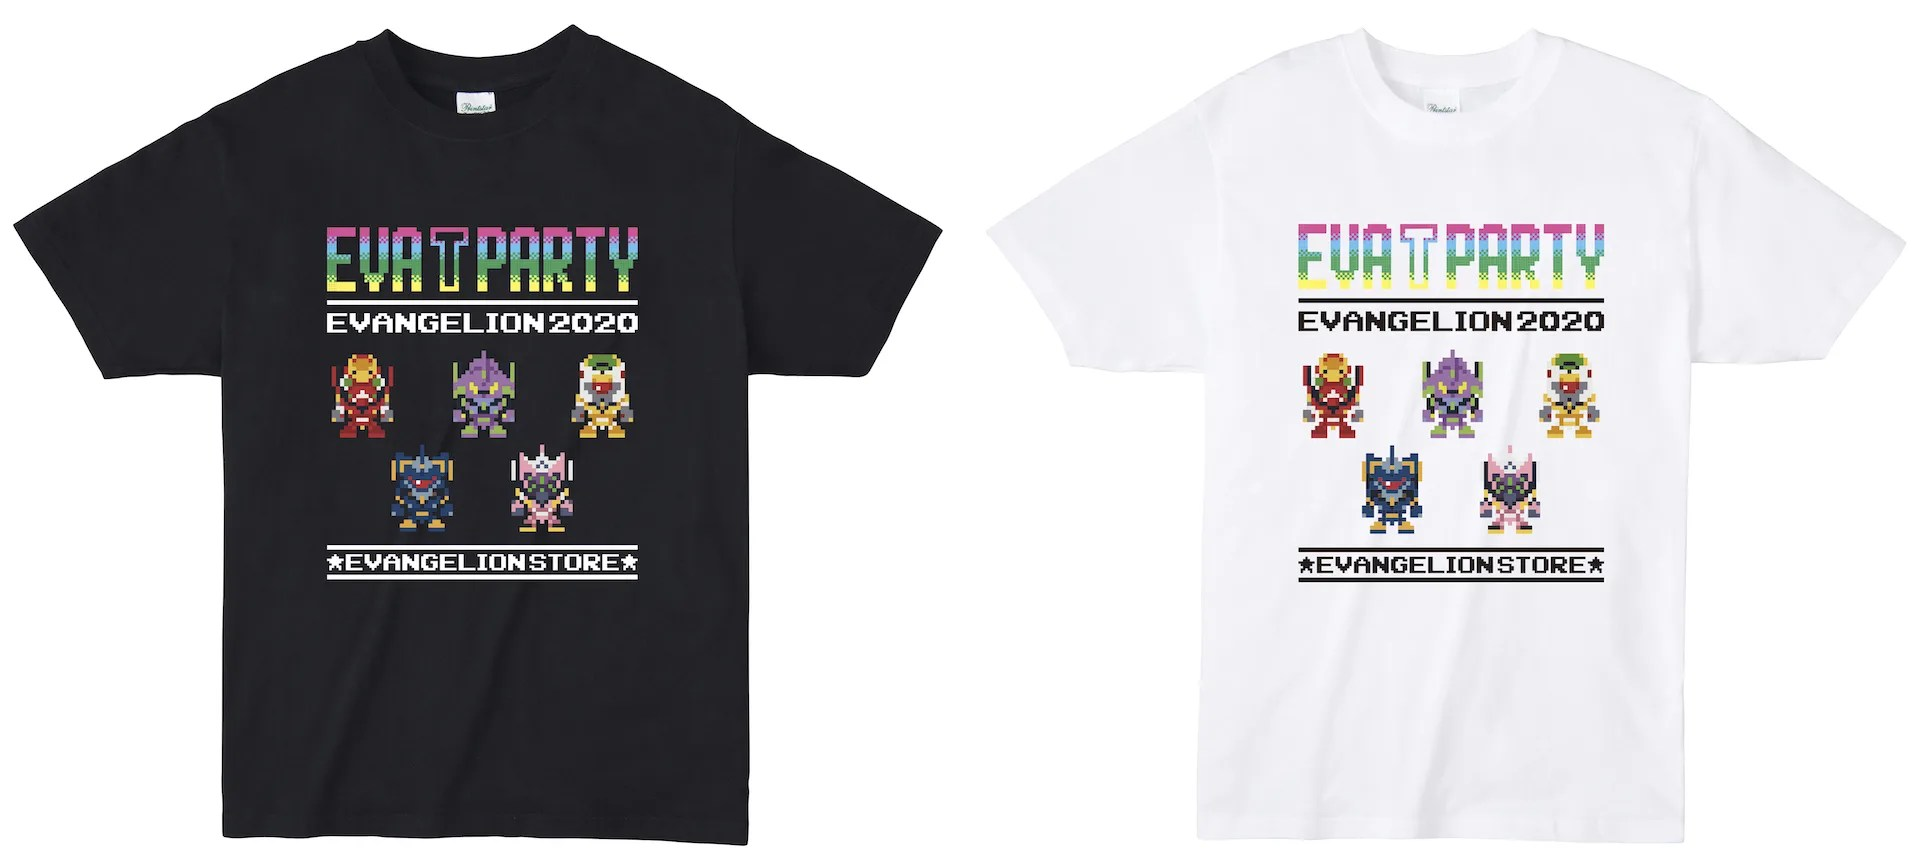 EVA T PARTY2020 イベント限定Tシャツ